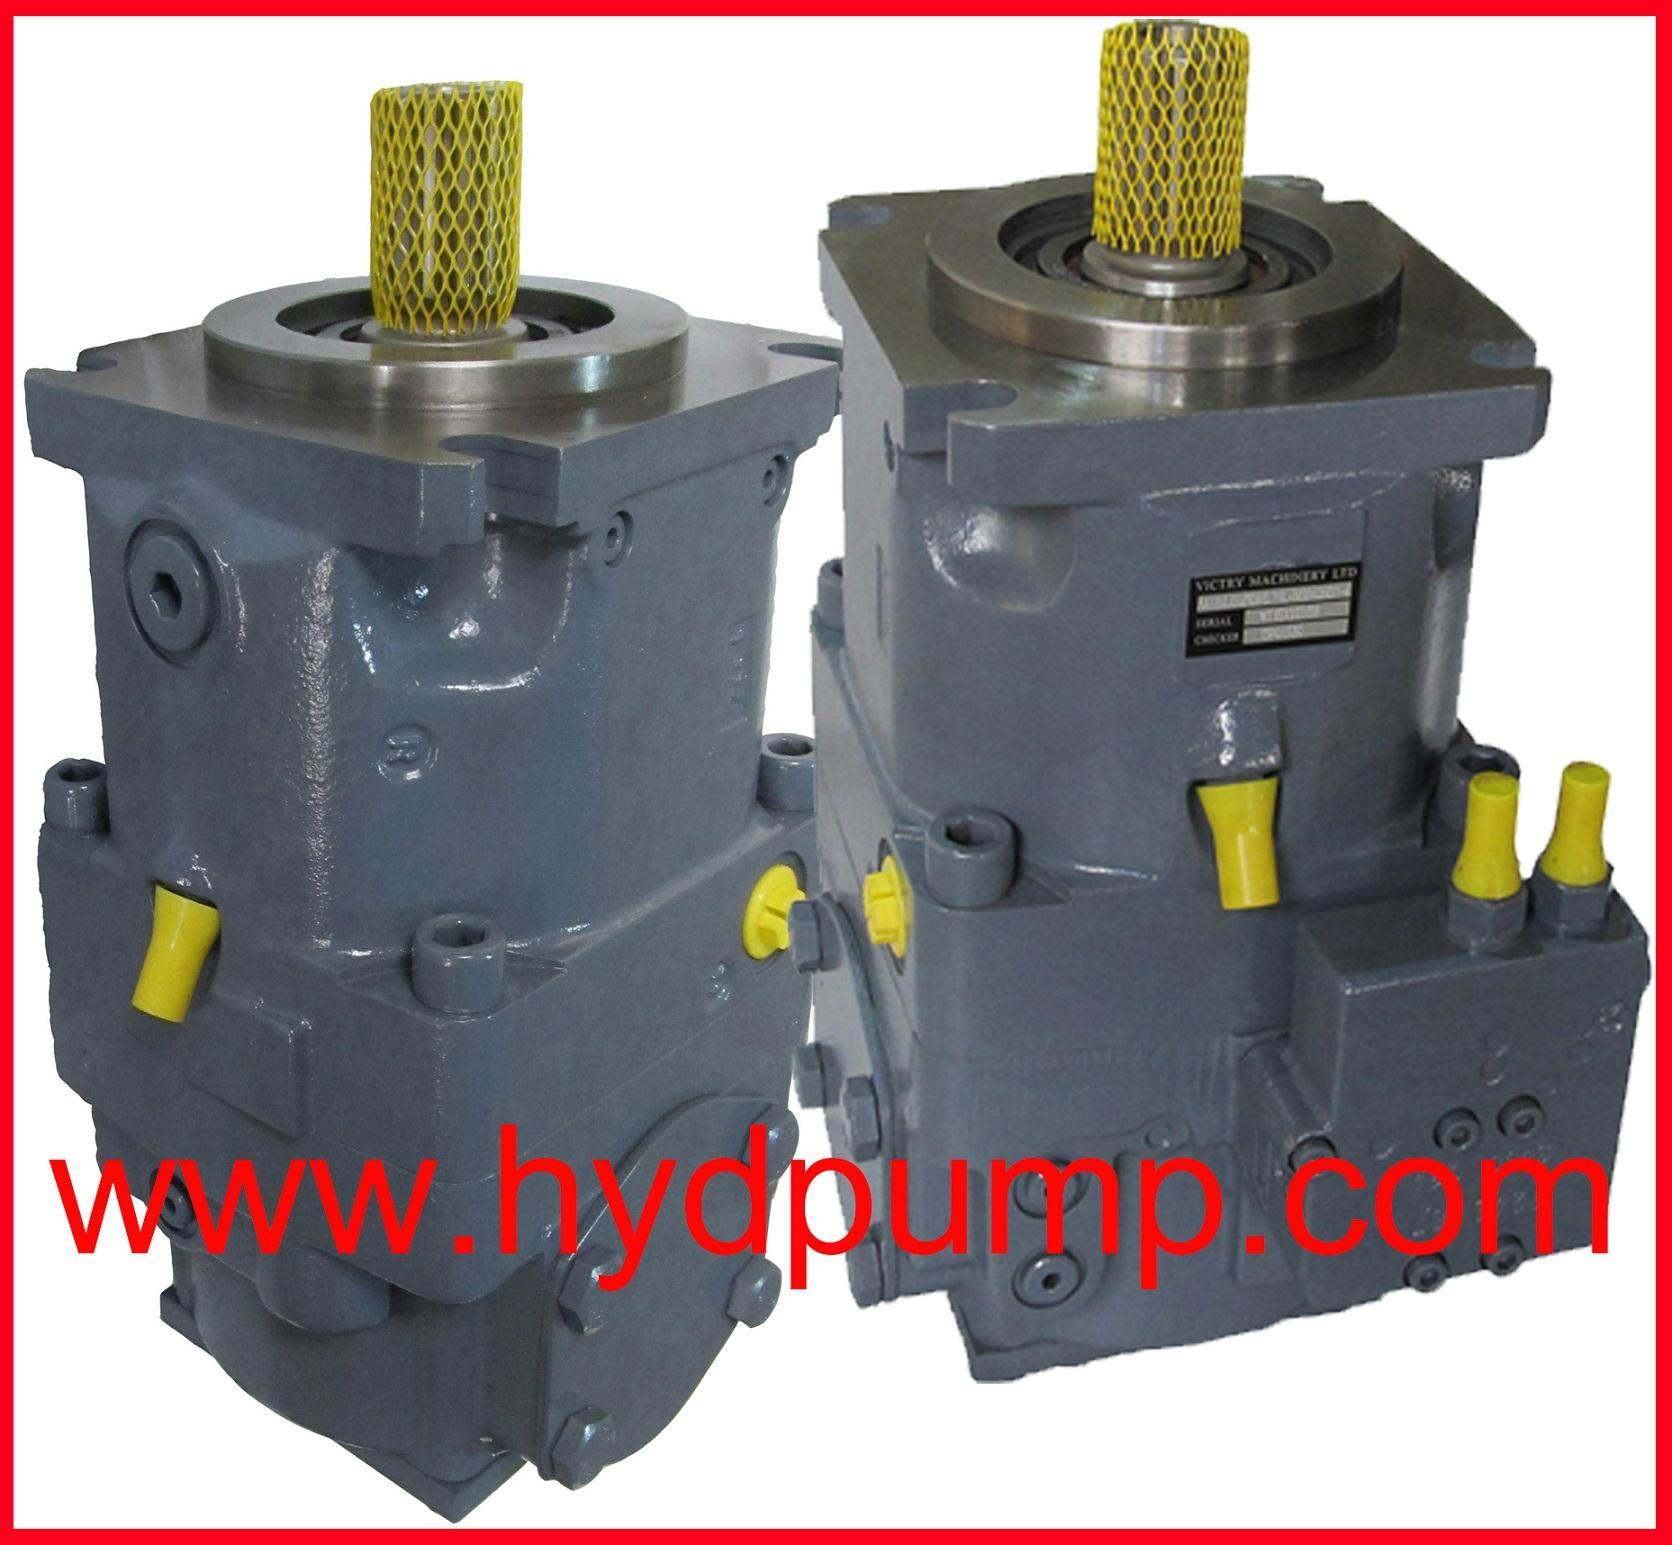 Hydraulic Piston Pump : Rexroth hydraulic piston pump a vo vlo china